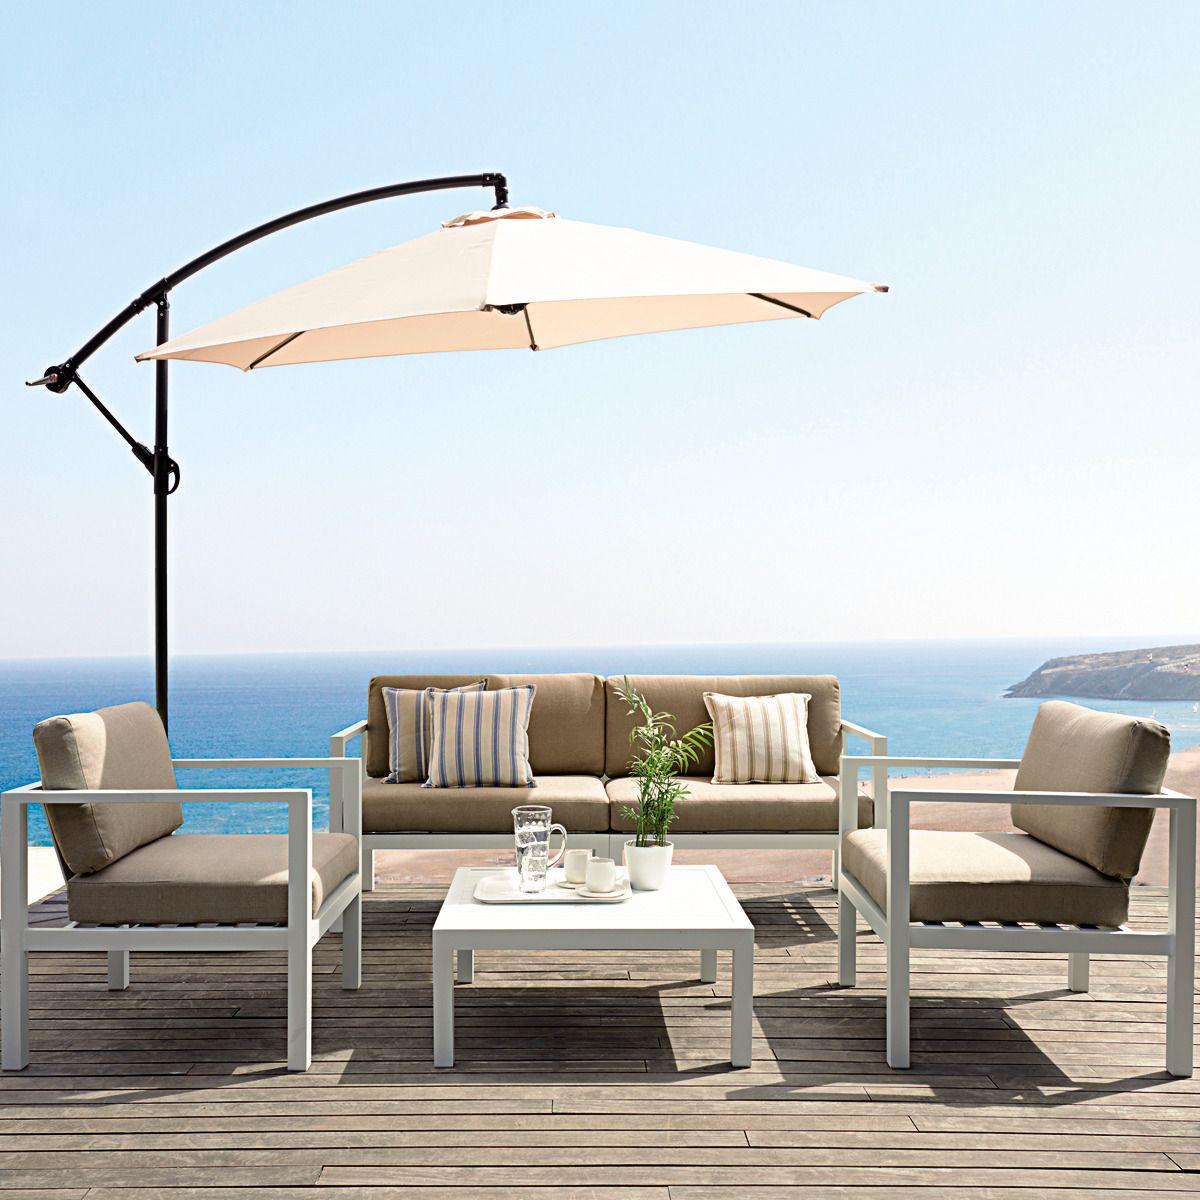 Conjunto con mesa de centro madison deco jard n terraza for Conjunto de terraza ikea